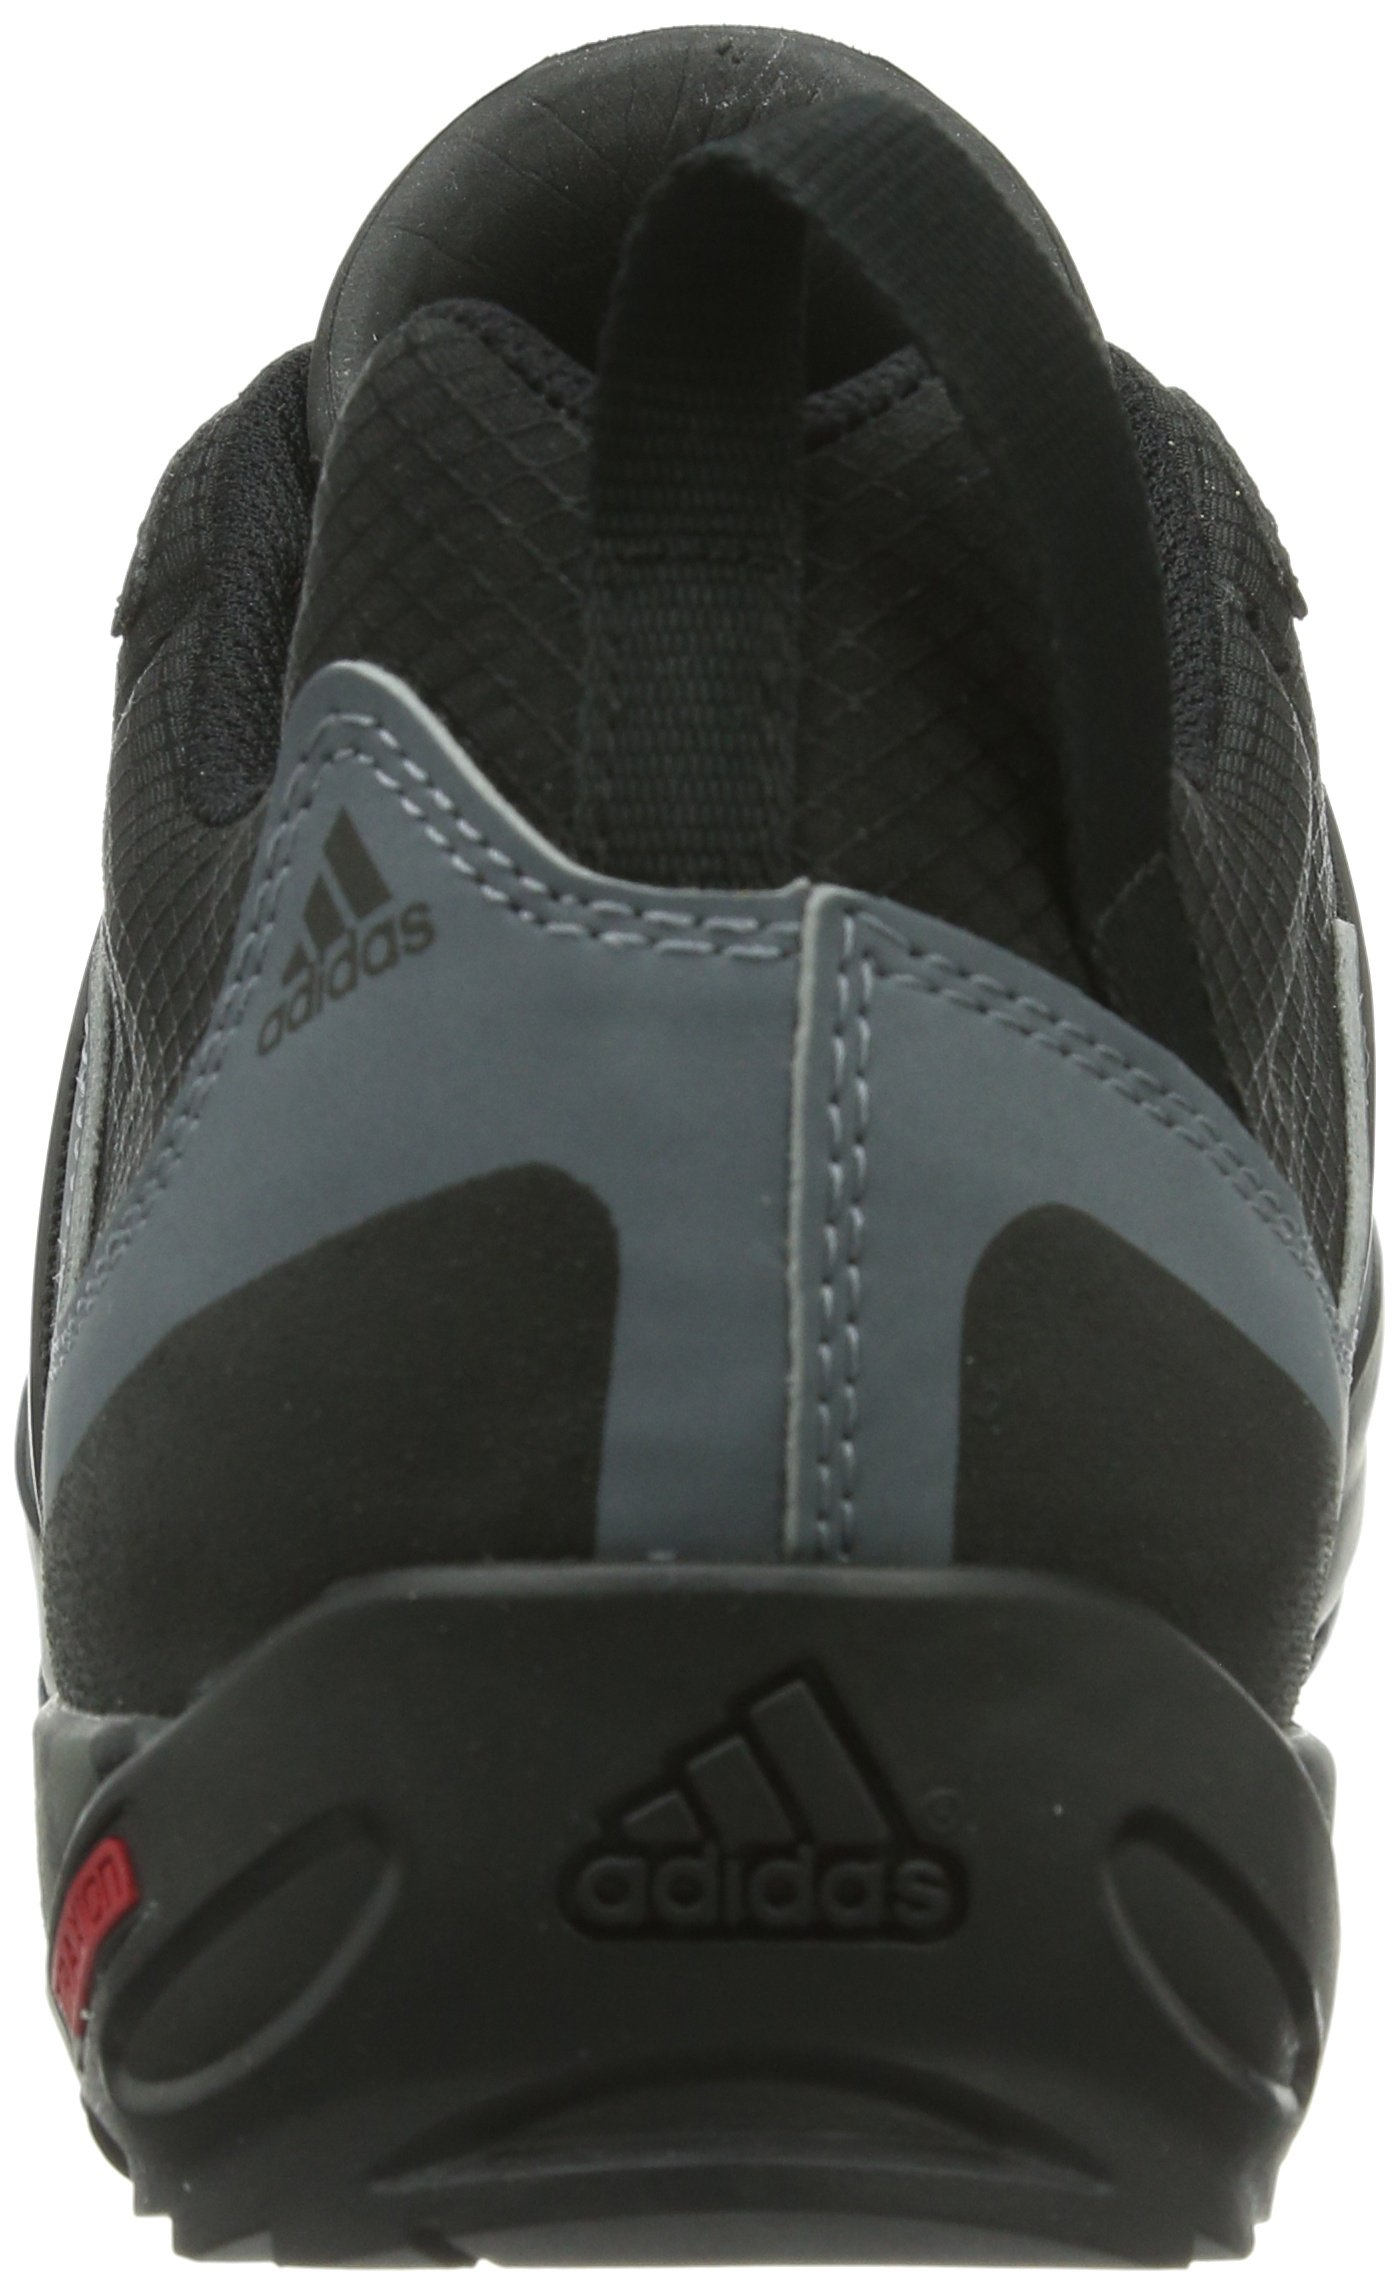 71qAgbz3vdL - adidas Terrex Swift Solo Unisex Adult Cross Trainers